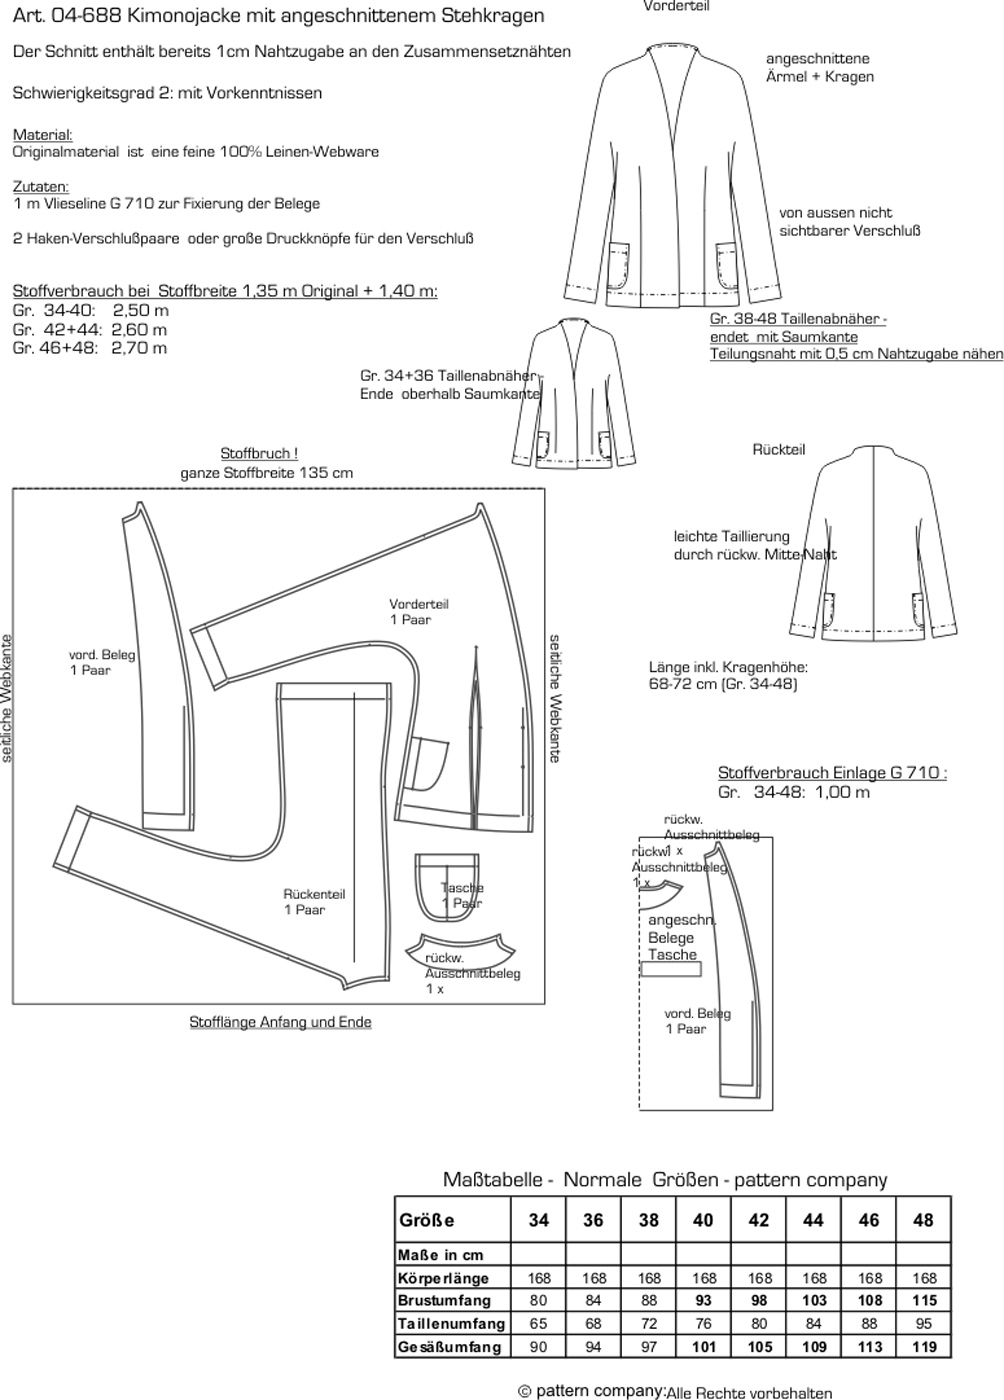 Schnittmuster - Kimonojacke mit Kragen - 04-688 - Pattern Company